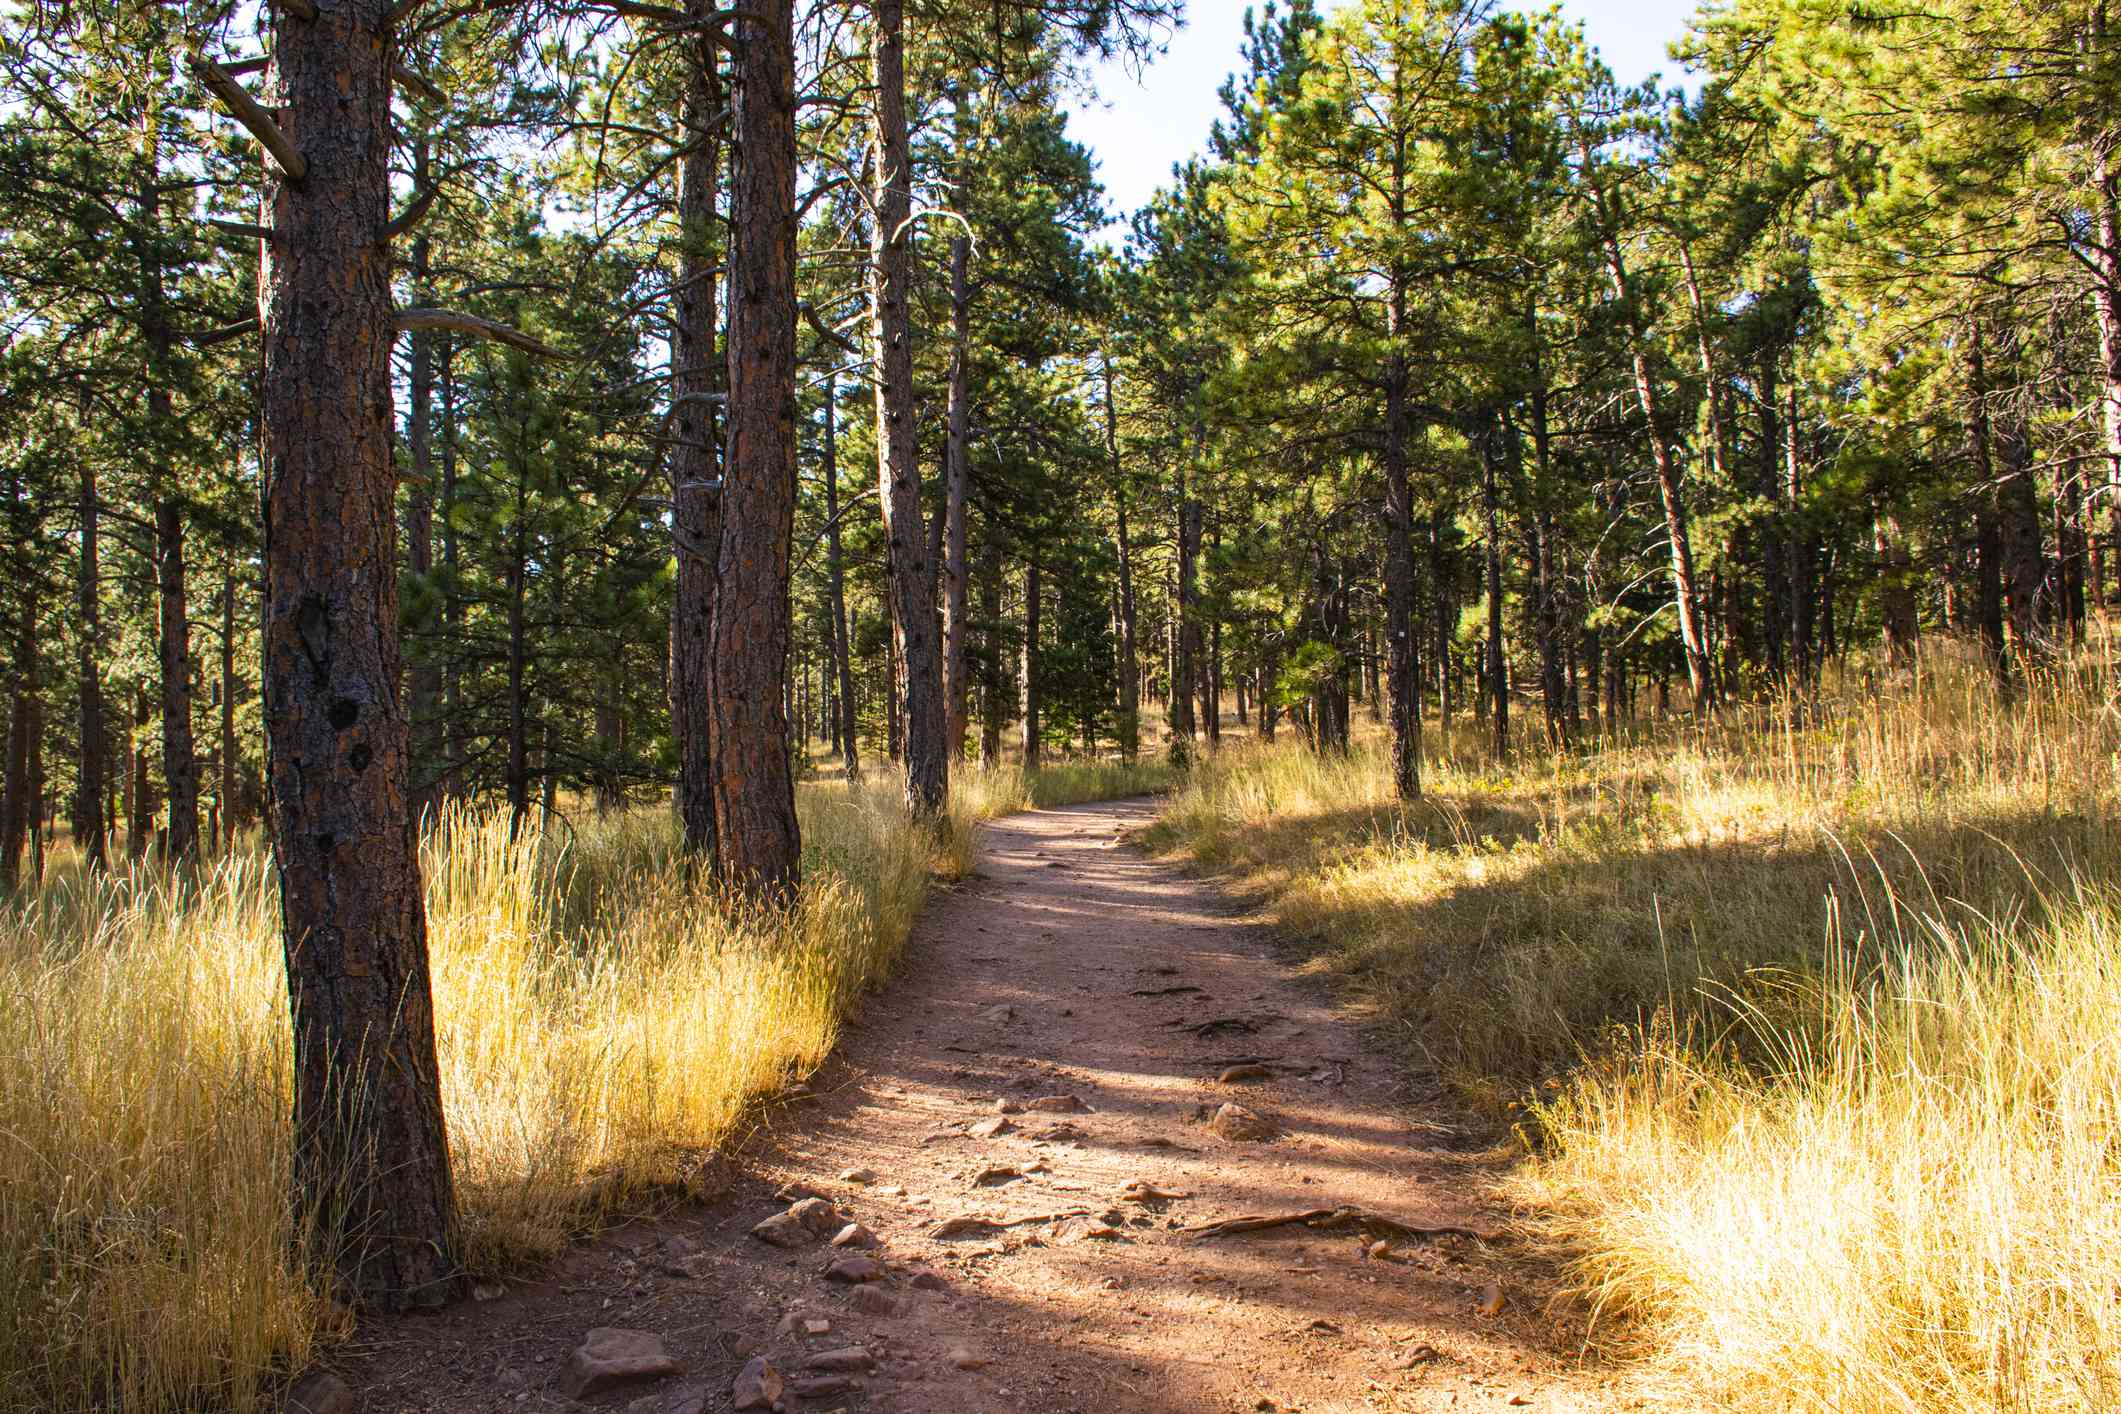 Hiking Trail in Chautauqua Park in Boulder, Colorado